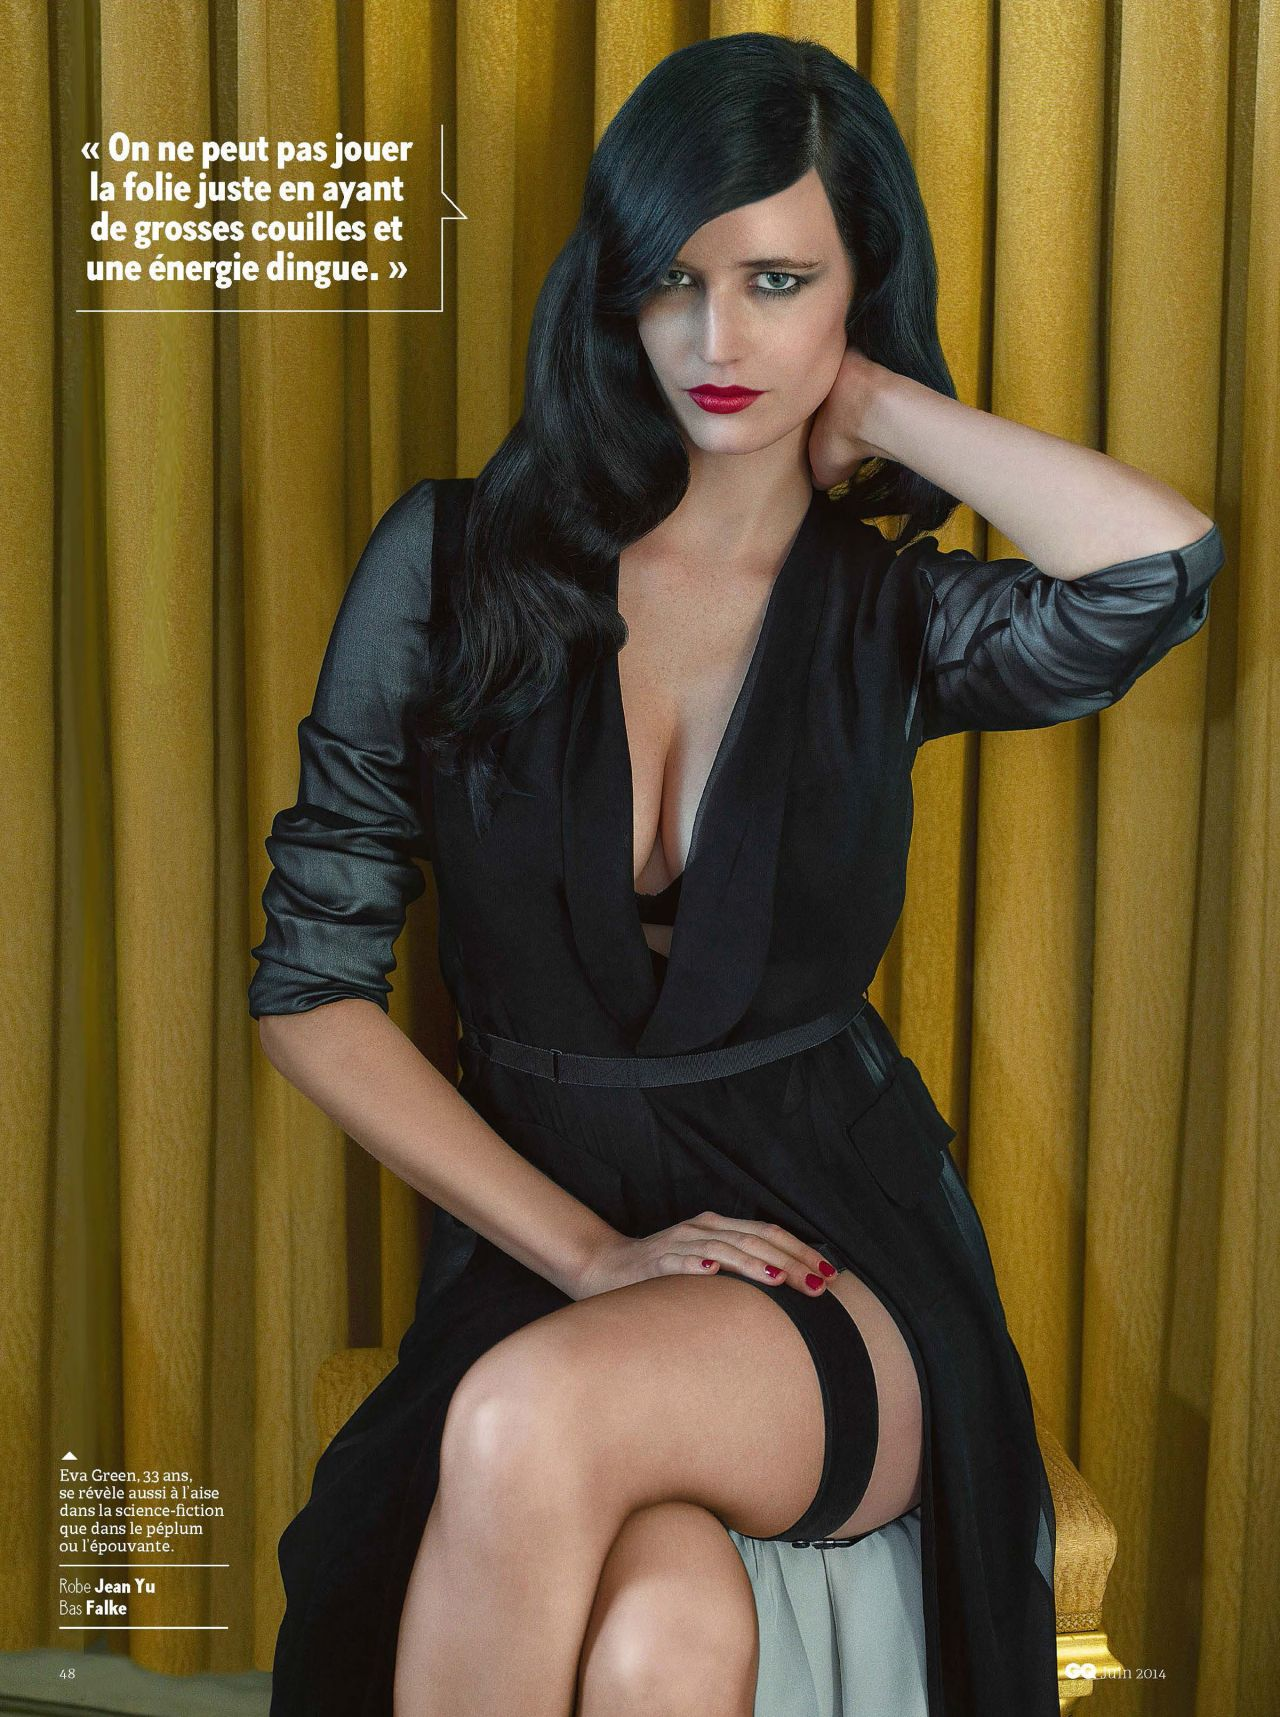 Eva Green - GQ MAgazine (France) - June 2014 Issue